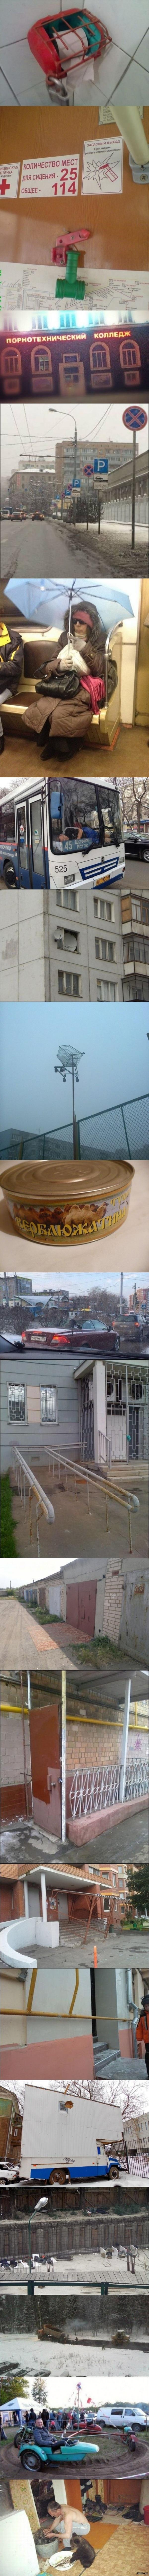 "Meanwhile in Russia (Выпуск 27) Двадцать шестой выпуск: <a href=""http://pikabu.ru/story/meanwhile_in_russia_vyipusk_26_2901479"">http://pikabu.ru/story/_2901479</a>"